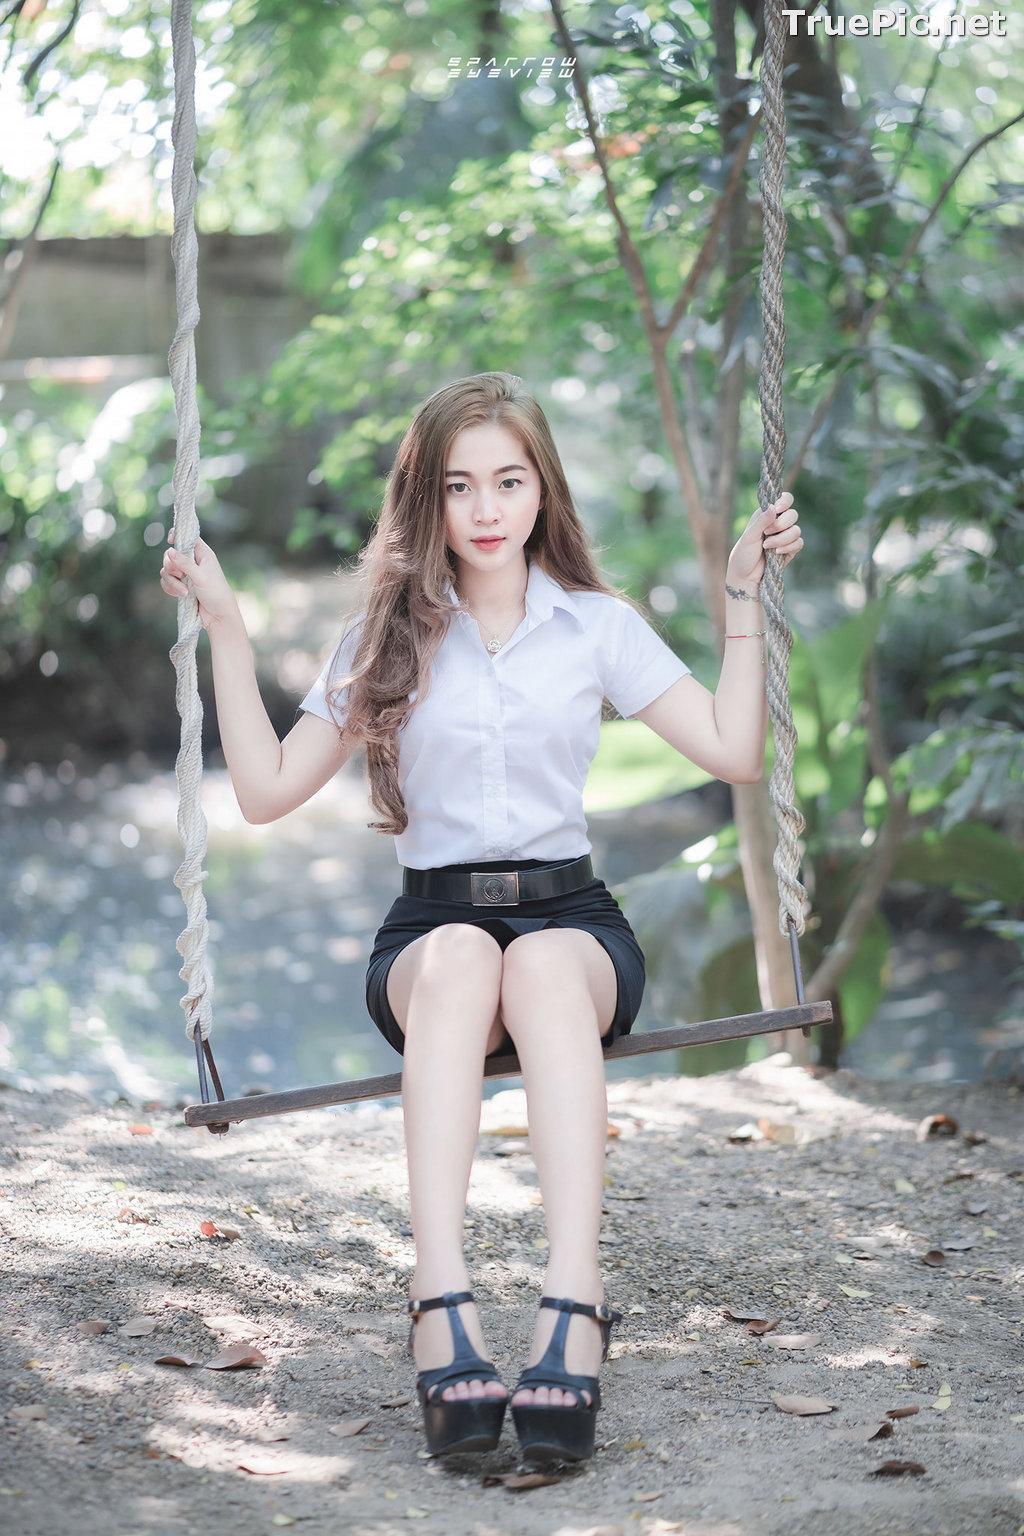 Image Thailand Model - นิภาภรณ์ เลิศนิติวัฒนา - Student Uniform - TruePic.net - Picture-1